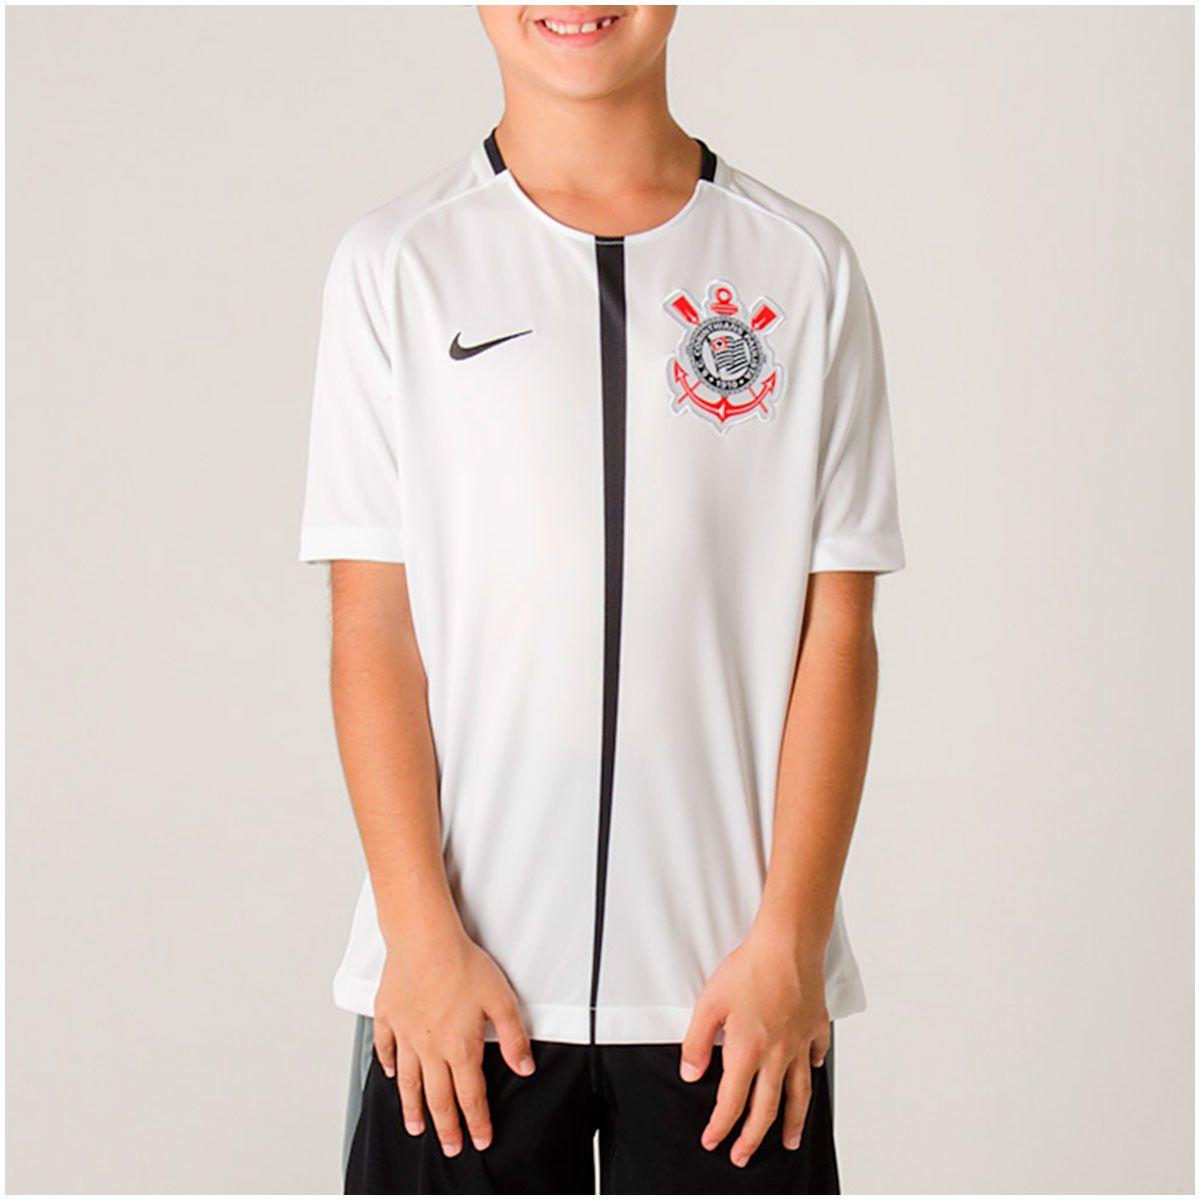 Camisa Corinthians I Nike 2018/19 Infantil